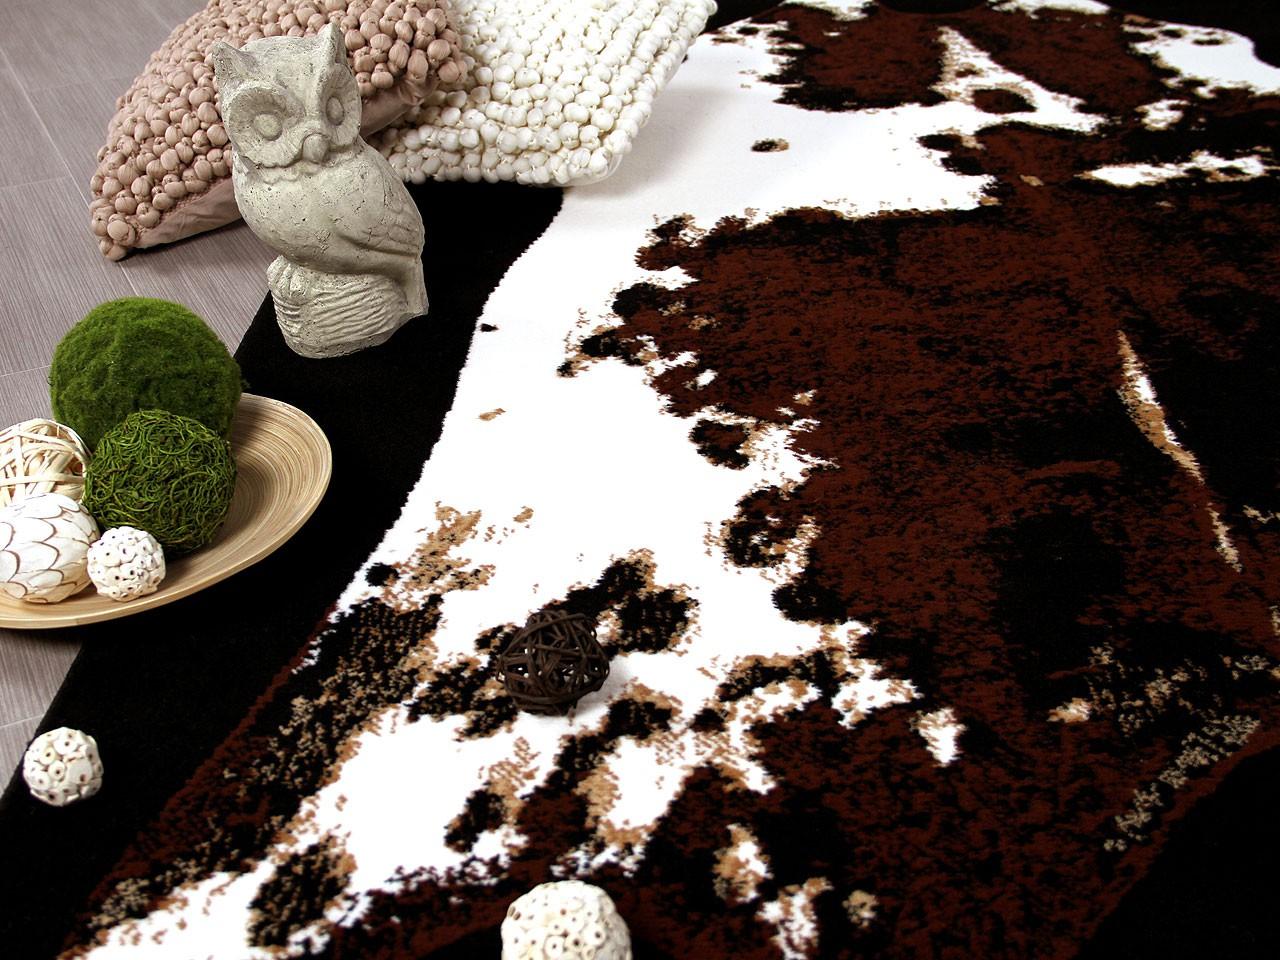 designer teppich safari rinderfell teppiche designerteppiche safari teppiche. Black Bedroom Furniture Sets. Home Design Ideas